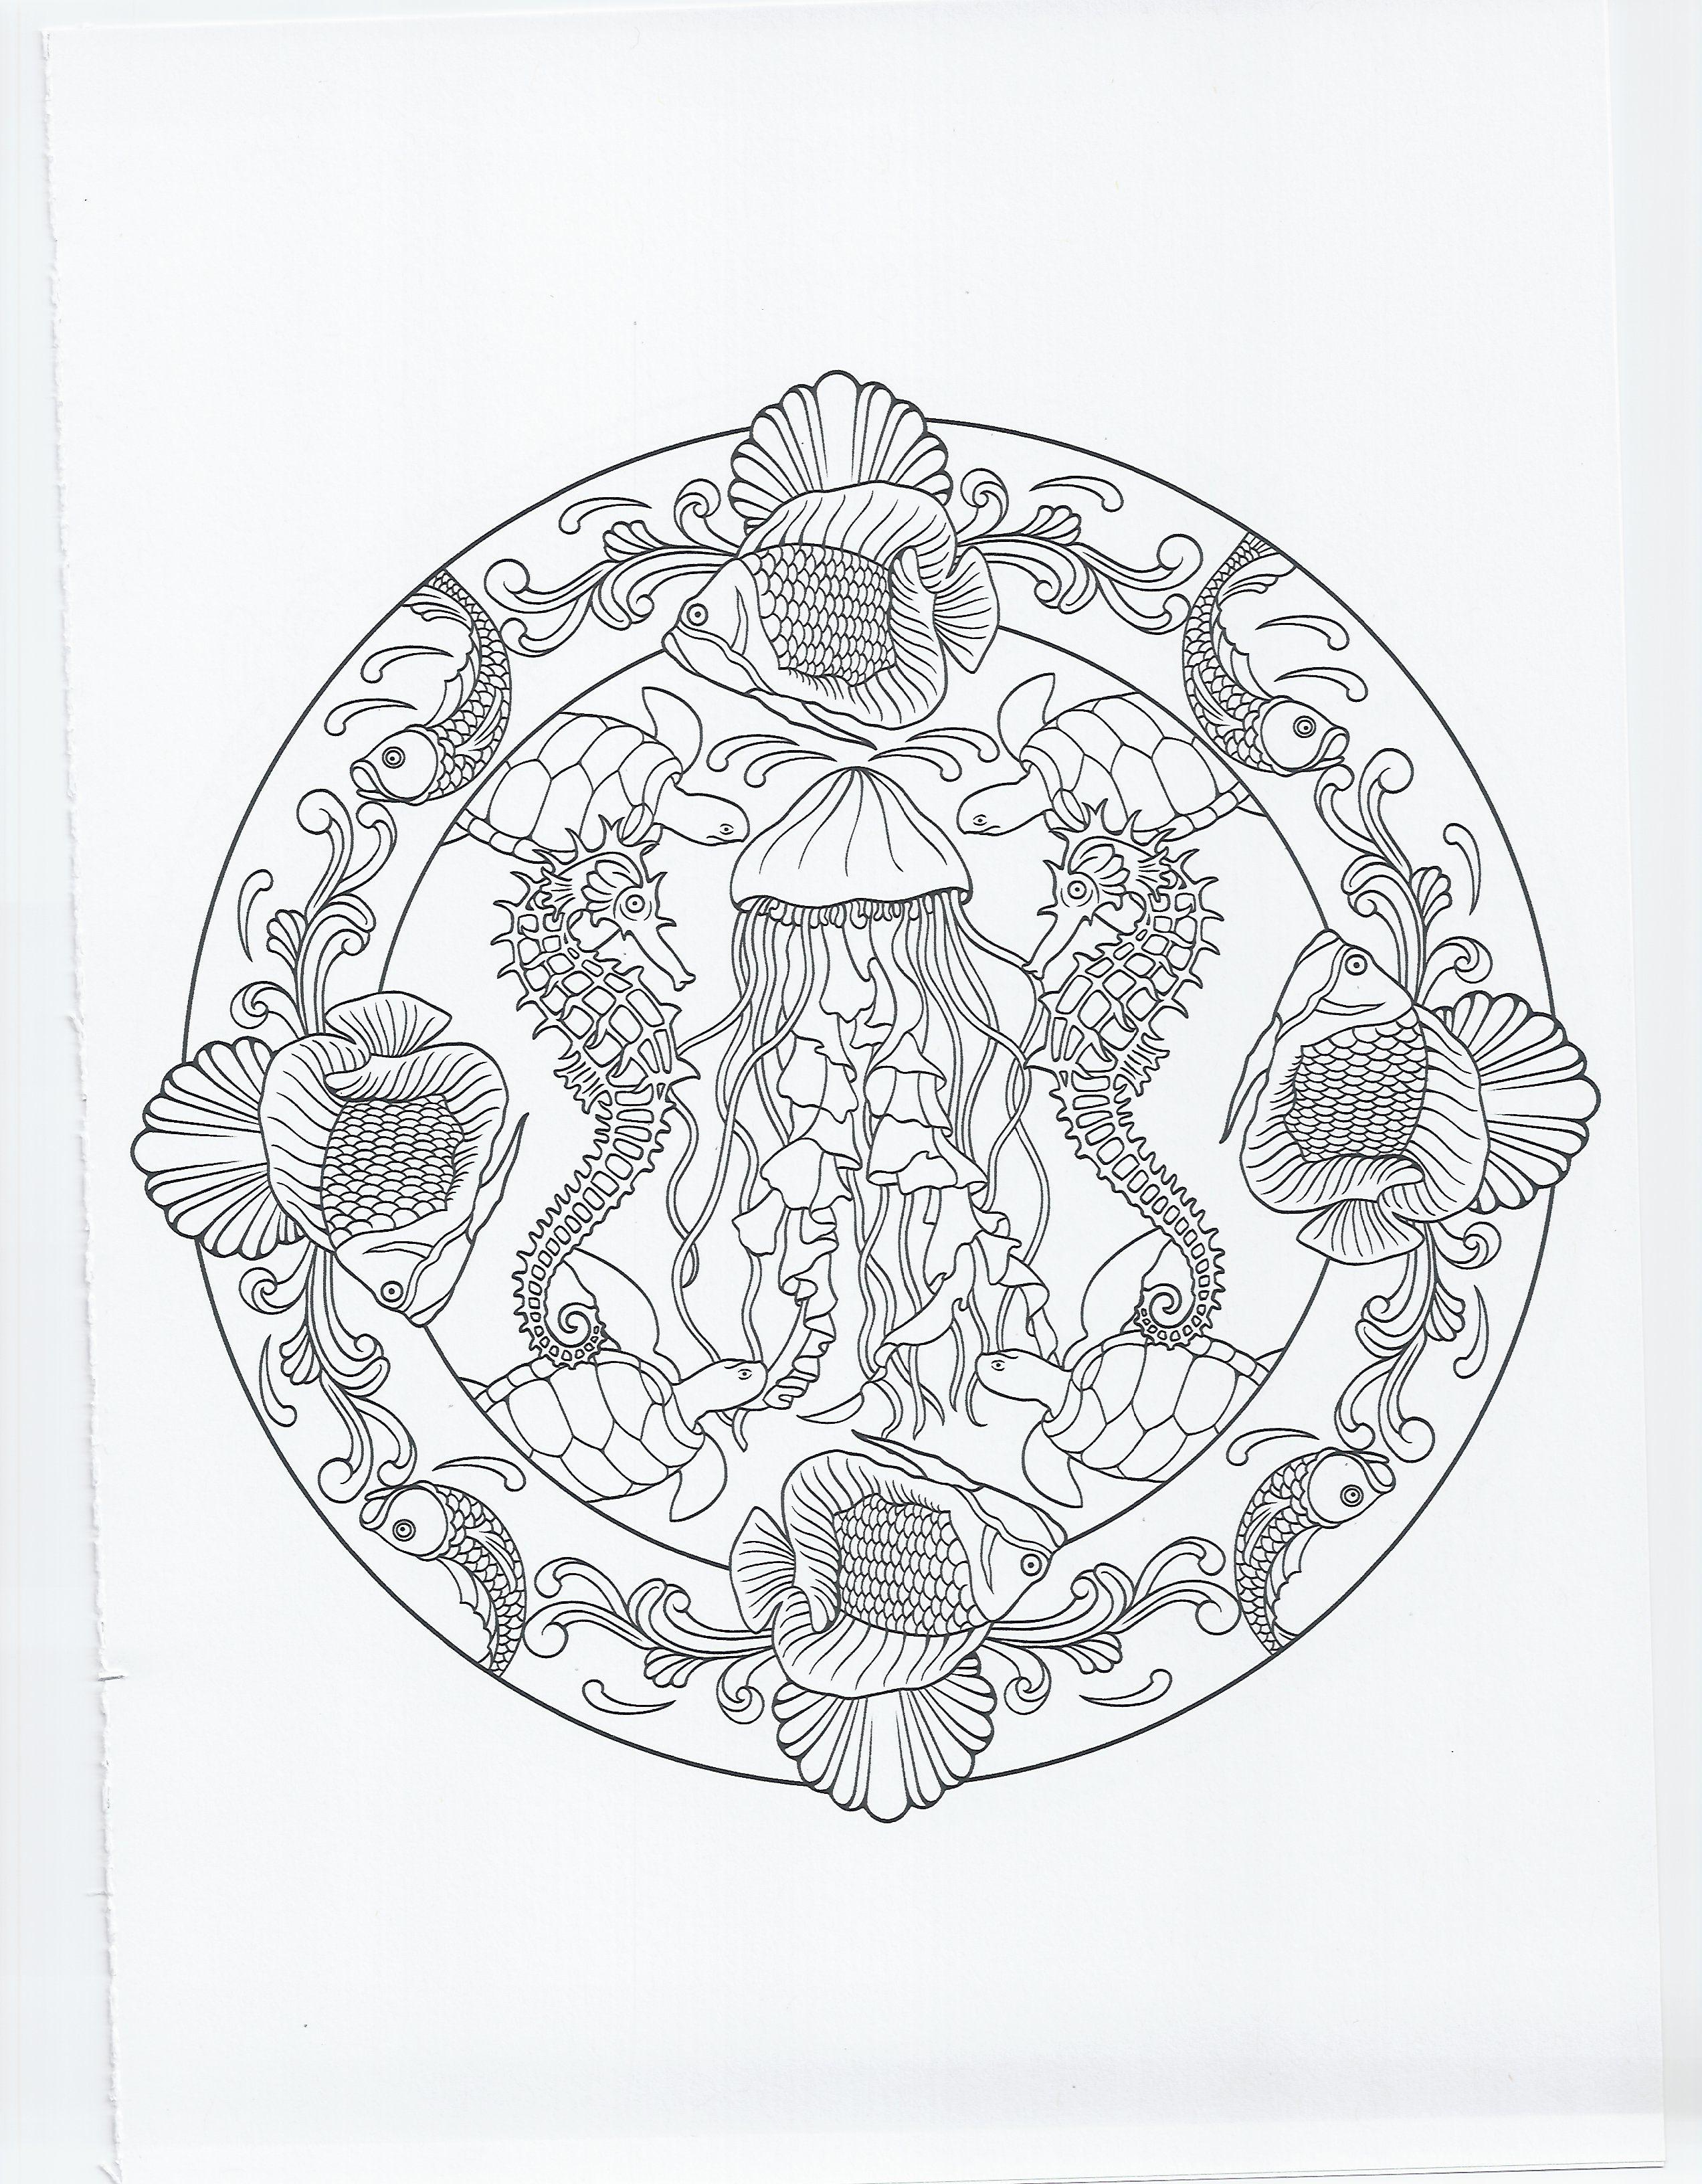 animal mandala seahorse coloring pages pinterest. Black Bedroom Furniture Sets. Home Design Ideas